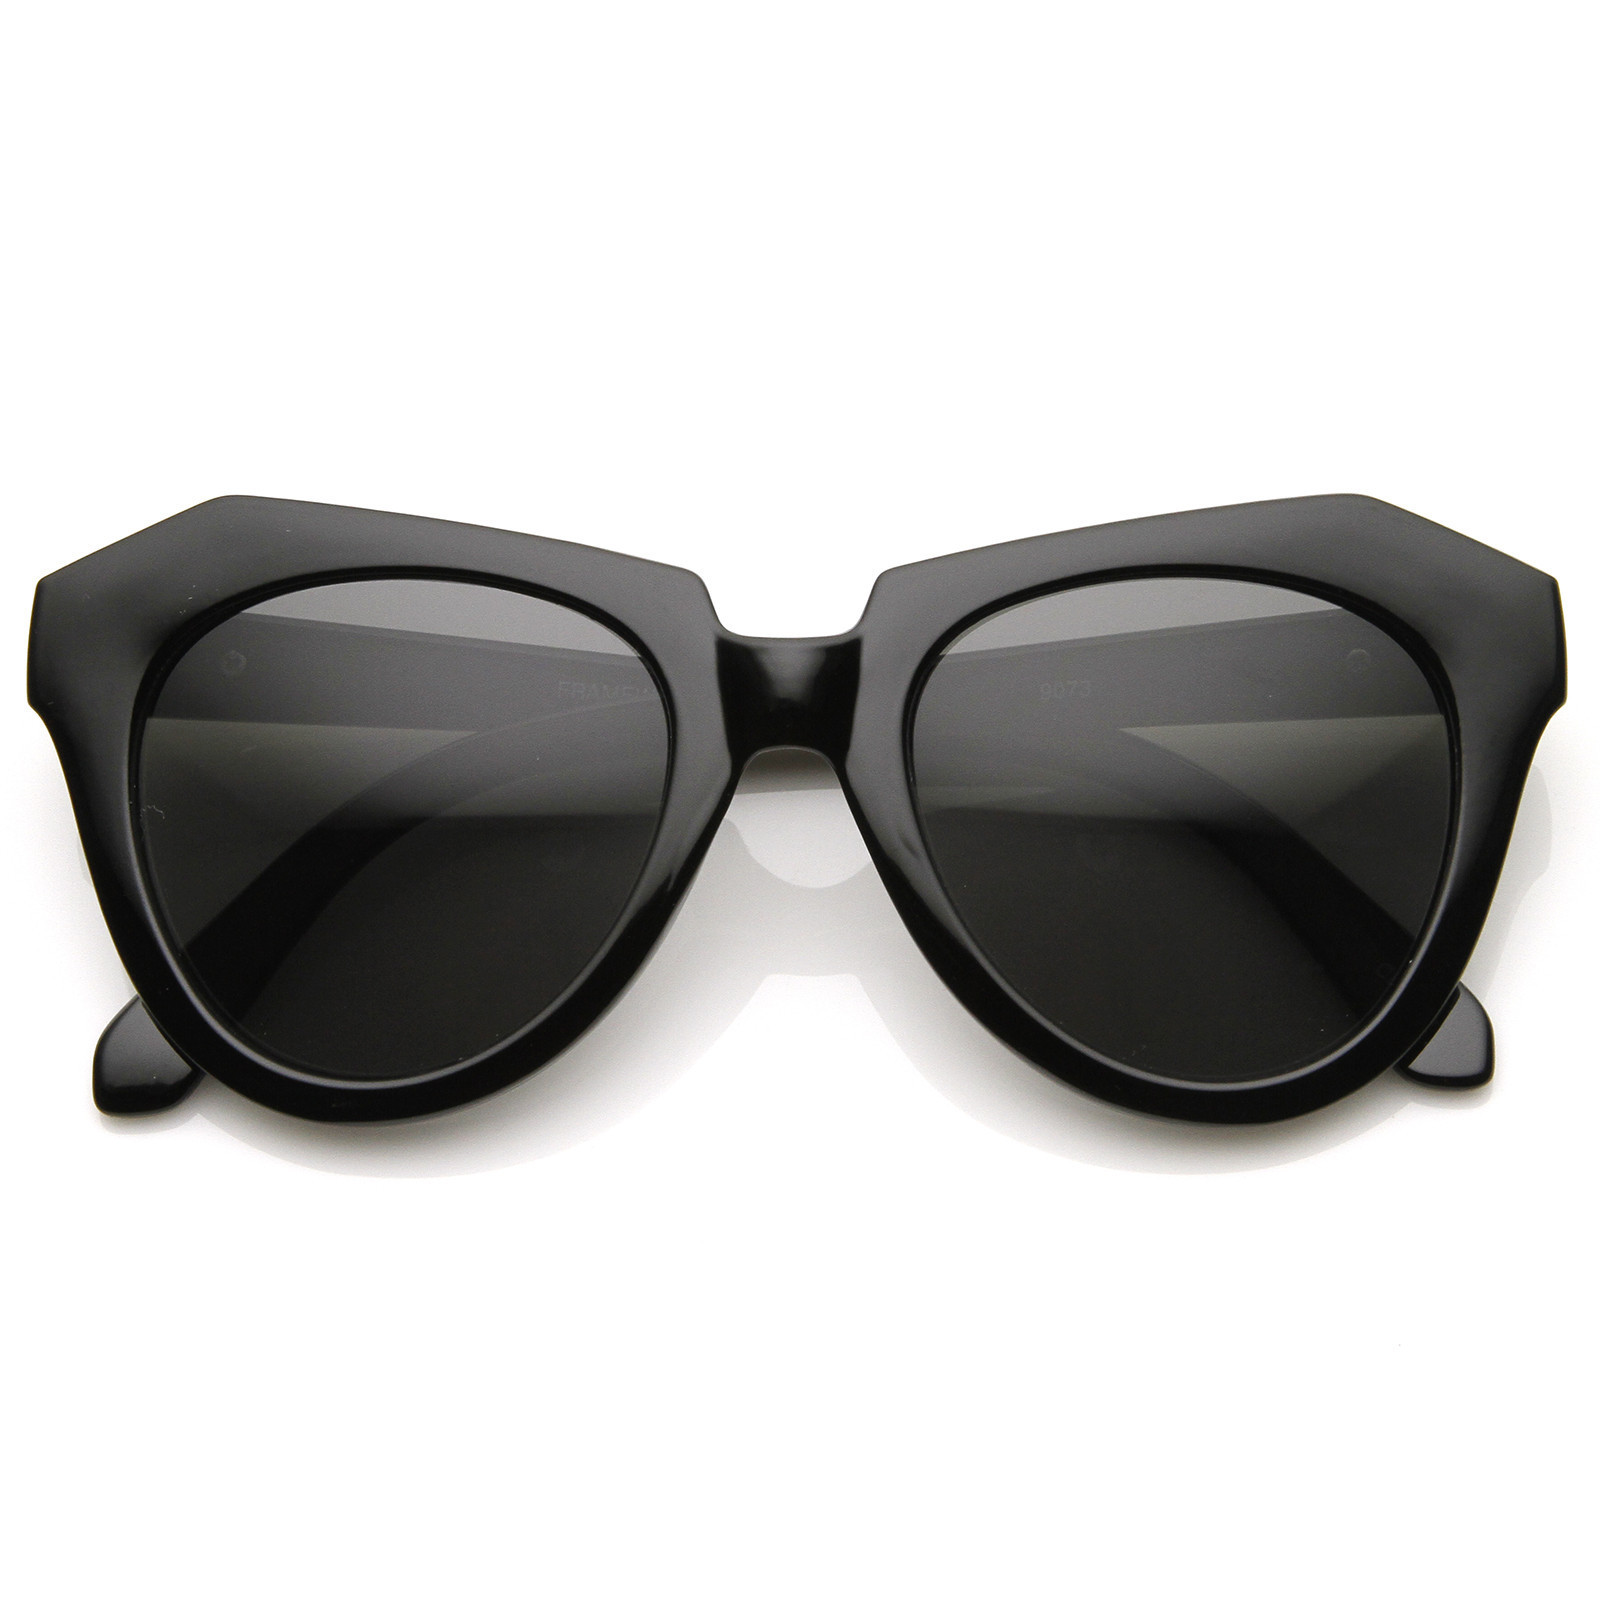 Oversize Designer Inspired Womens Fashion Sunglasses 8445